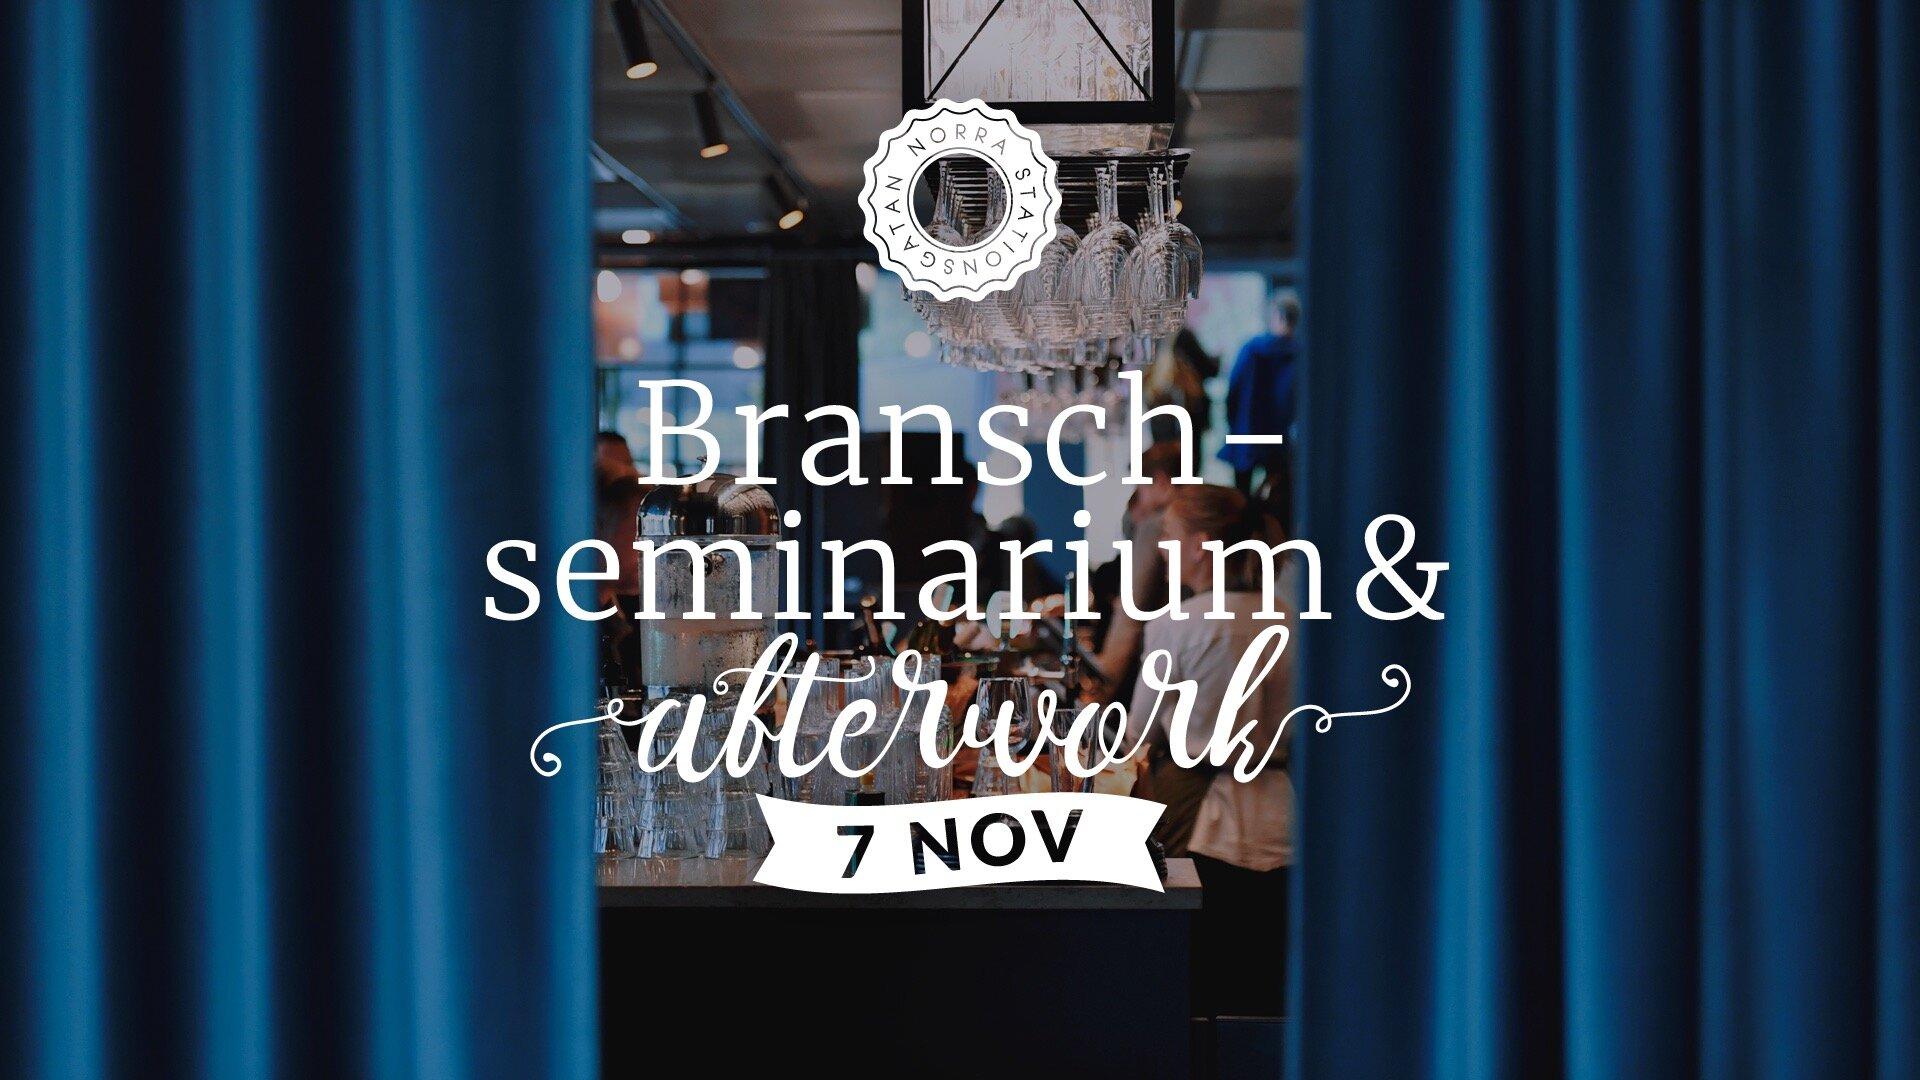 NS-Bransch+AW-Nov-2019-1920x1080px-1-resize-1920x1080.jpg